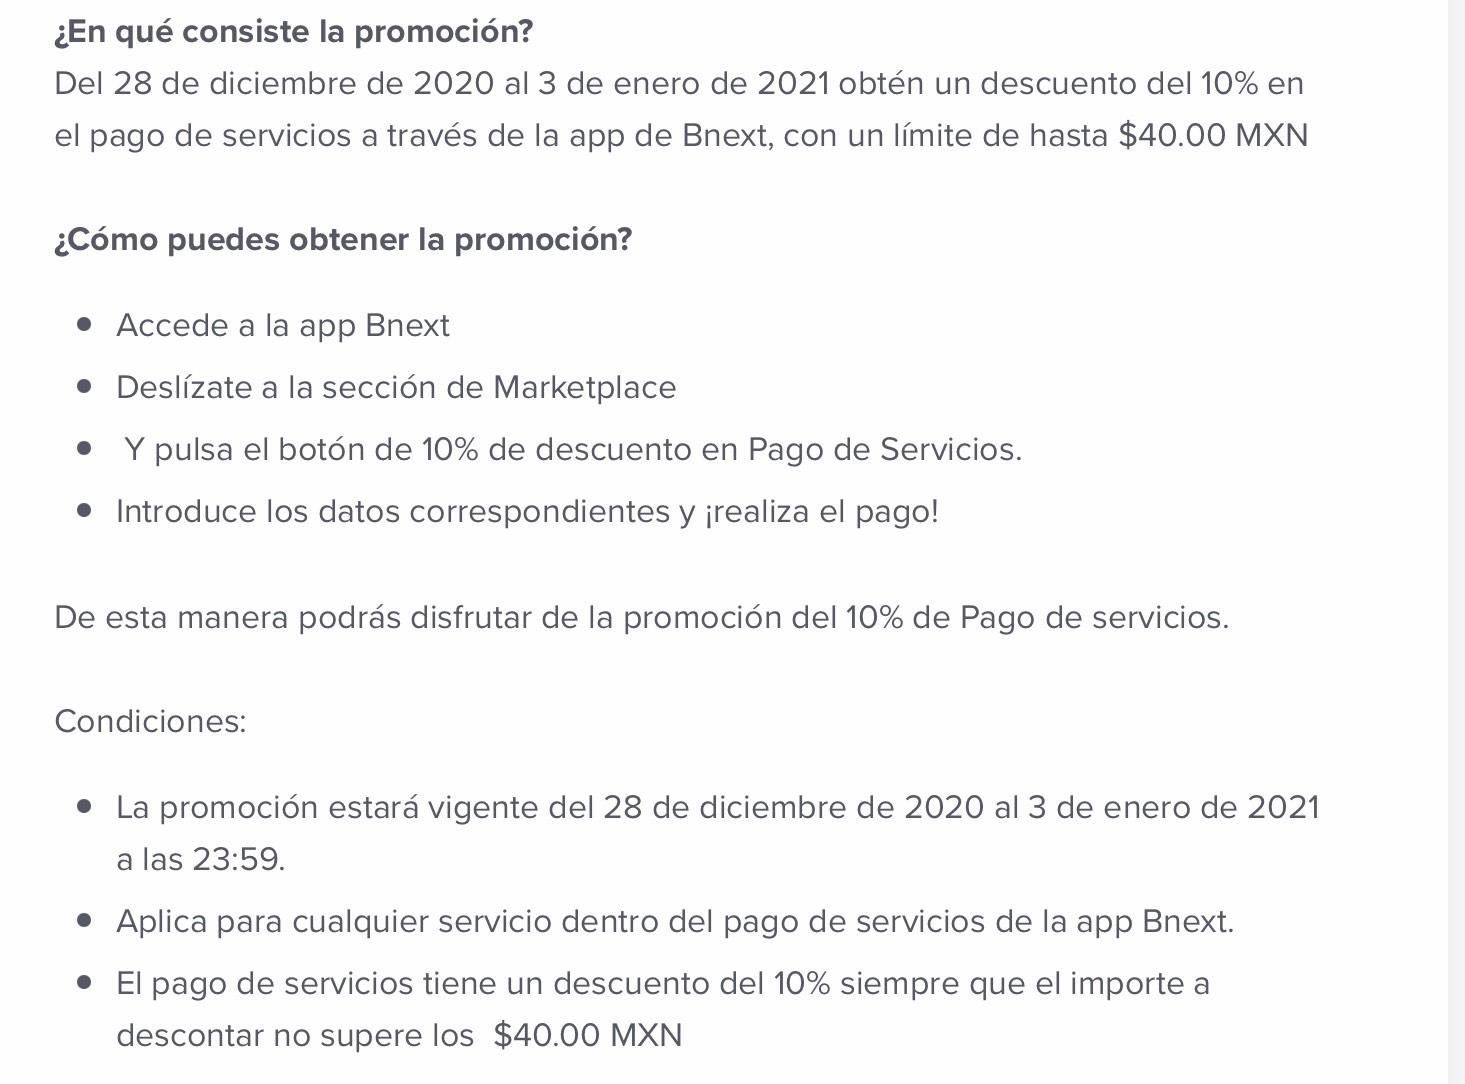 10% pago de servicios con Bnext